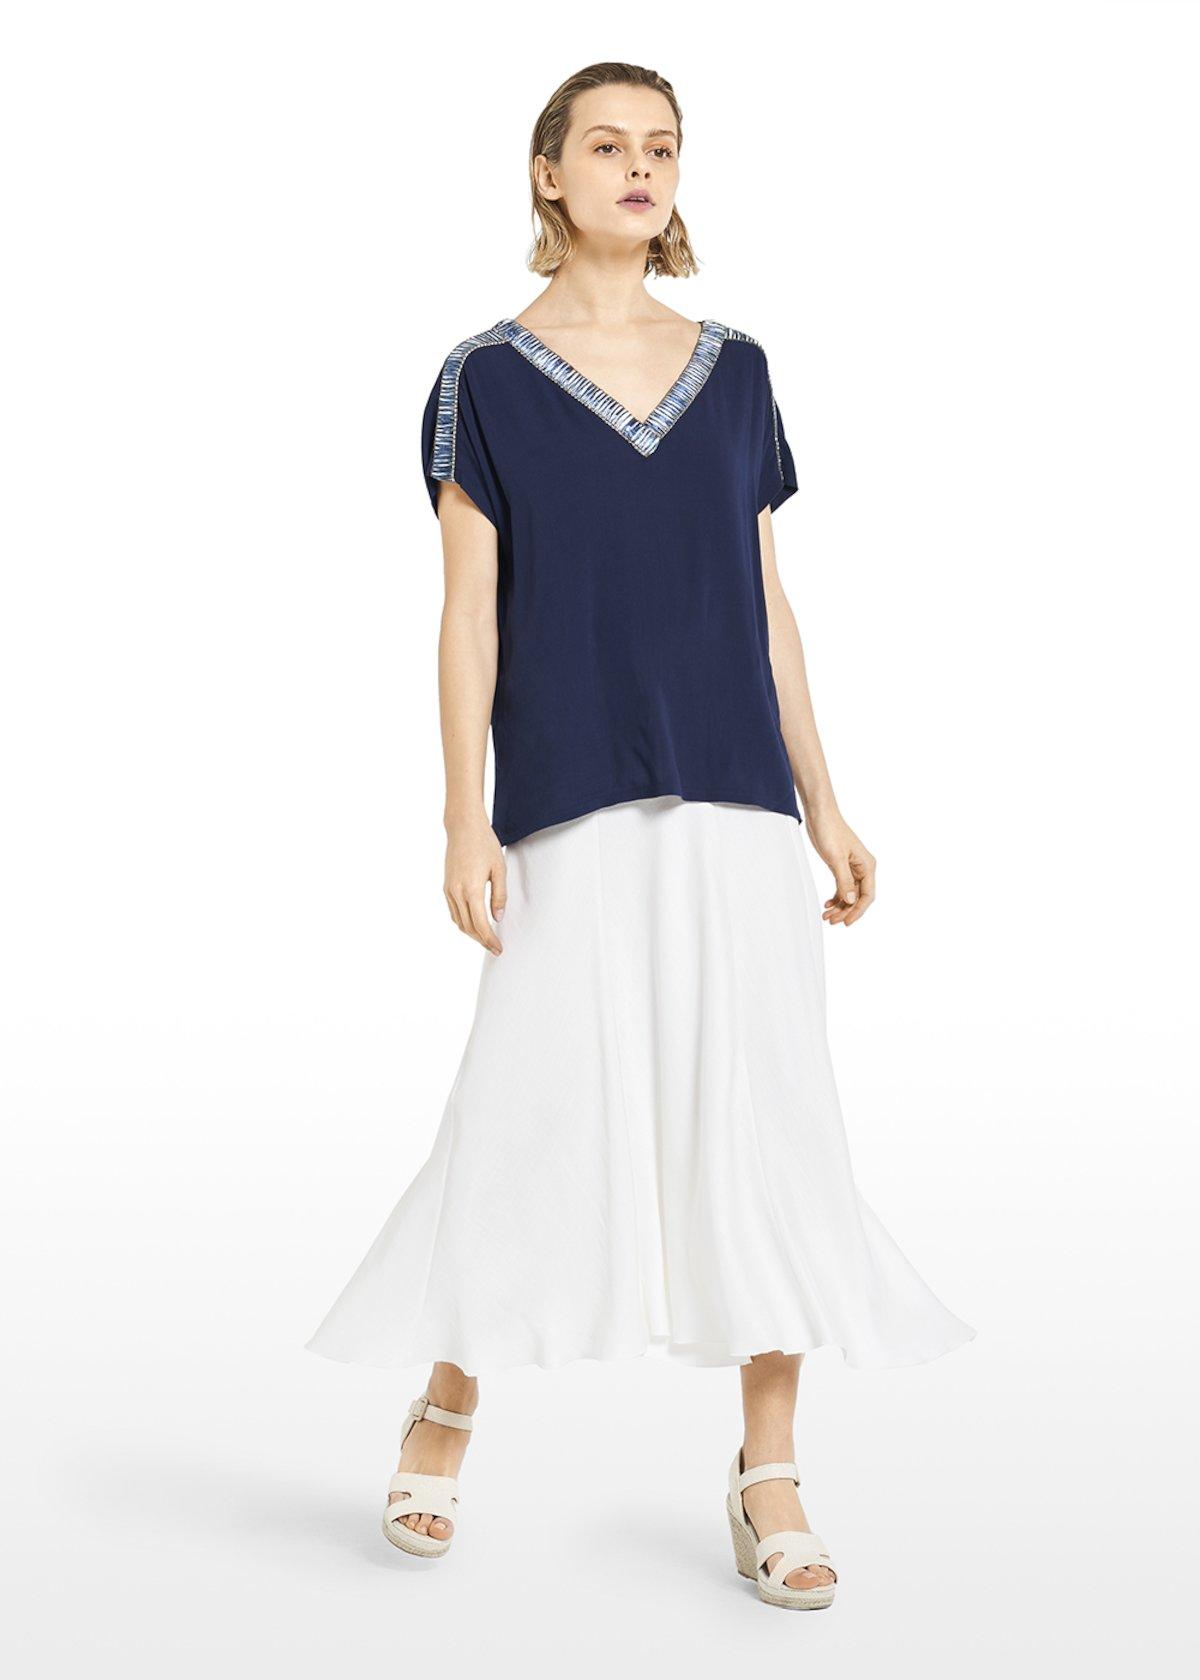 Sirena T-shirt with trimmed neckline detail